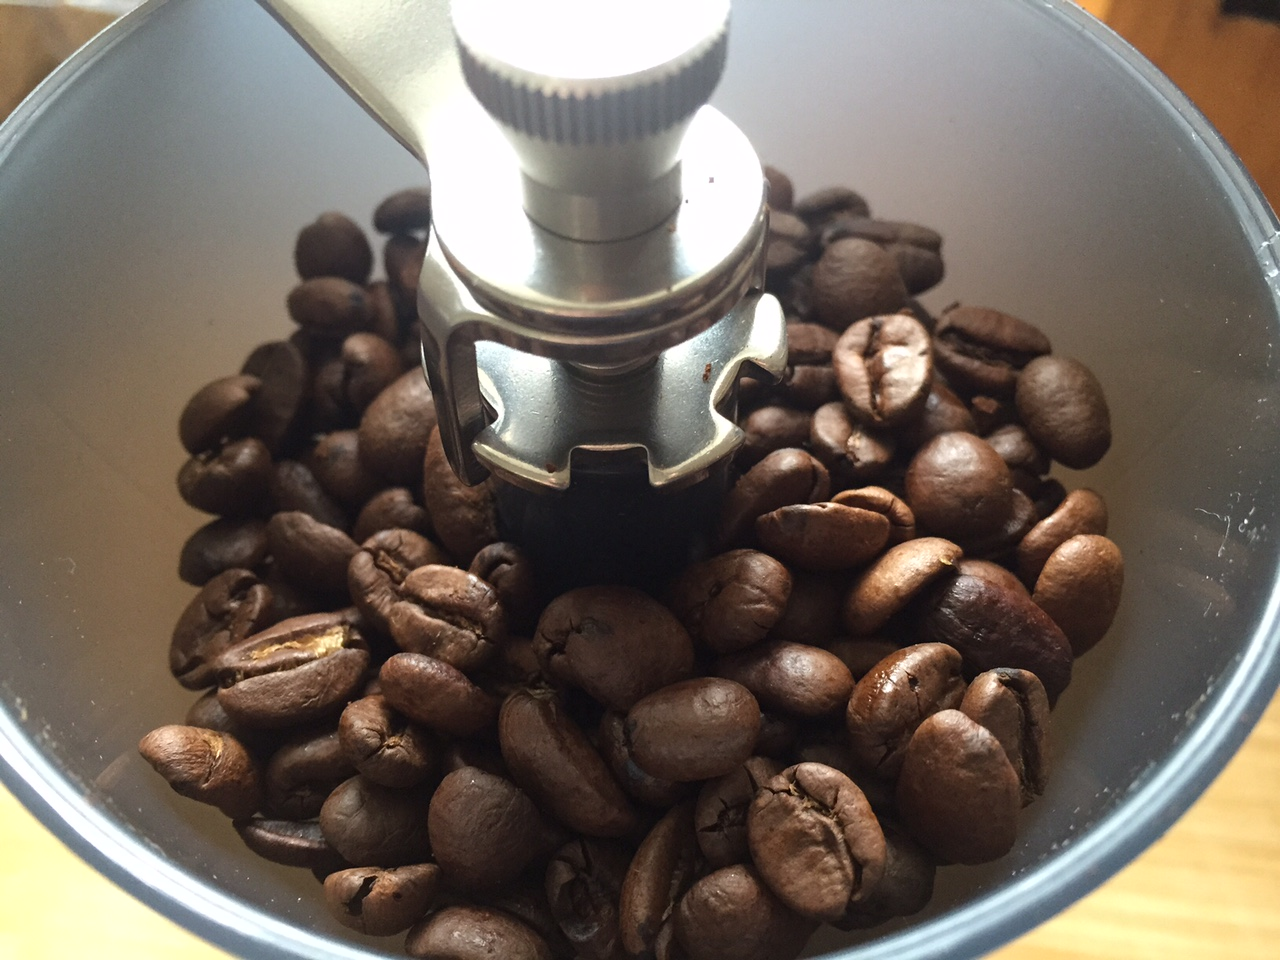 Kaffeefüllmenge bei der Skerton Kaffeemühle